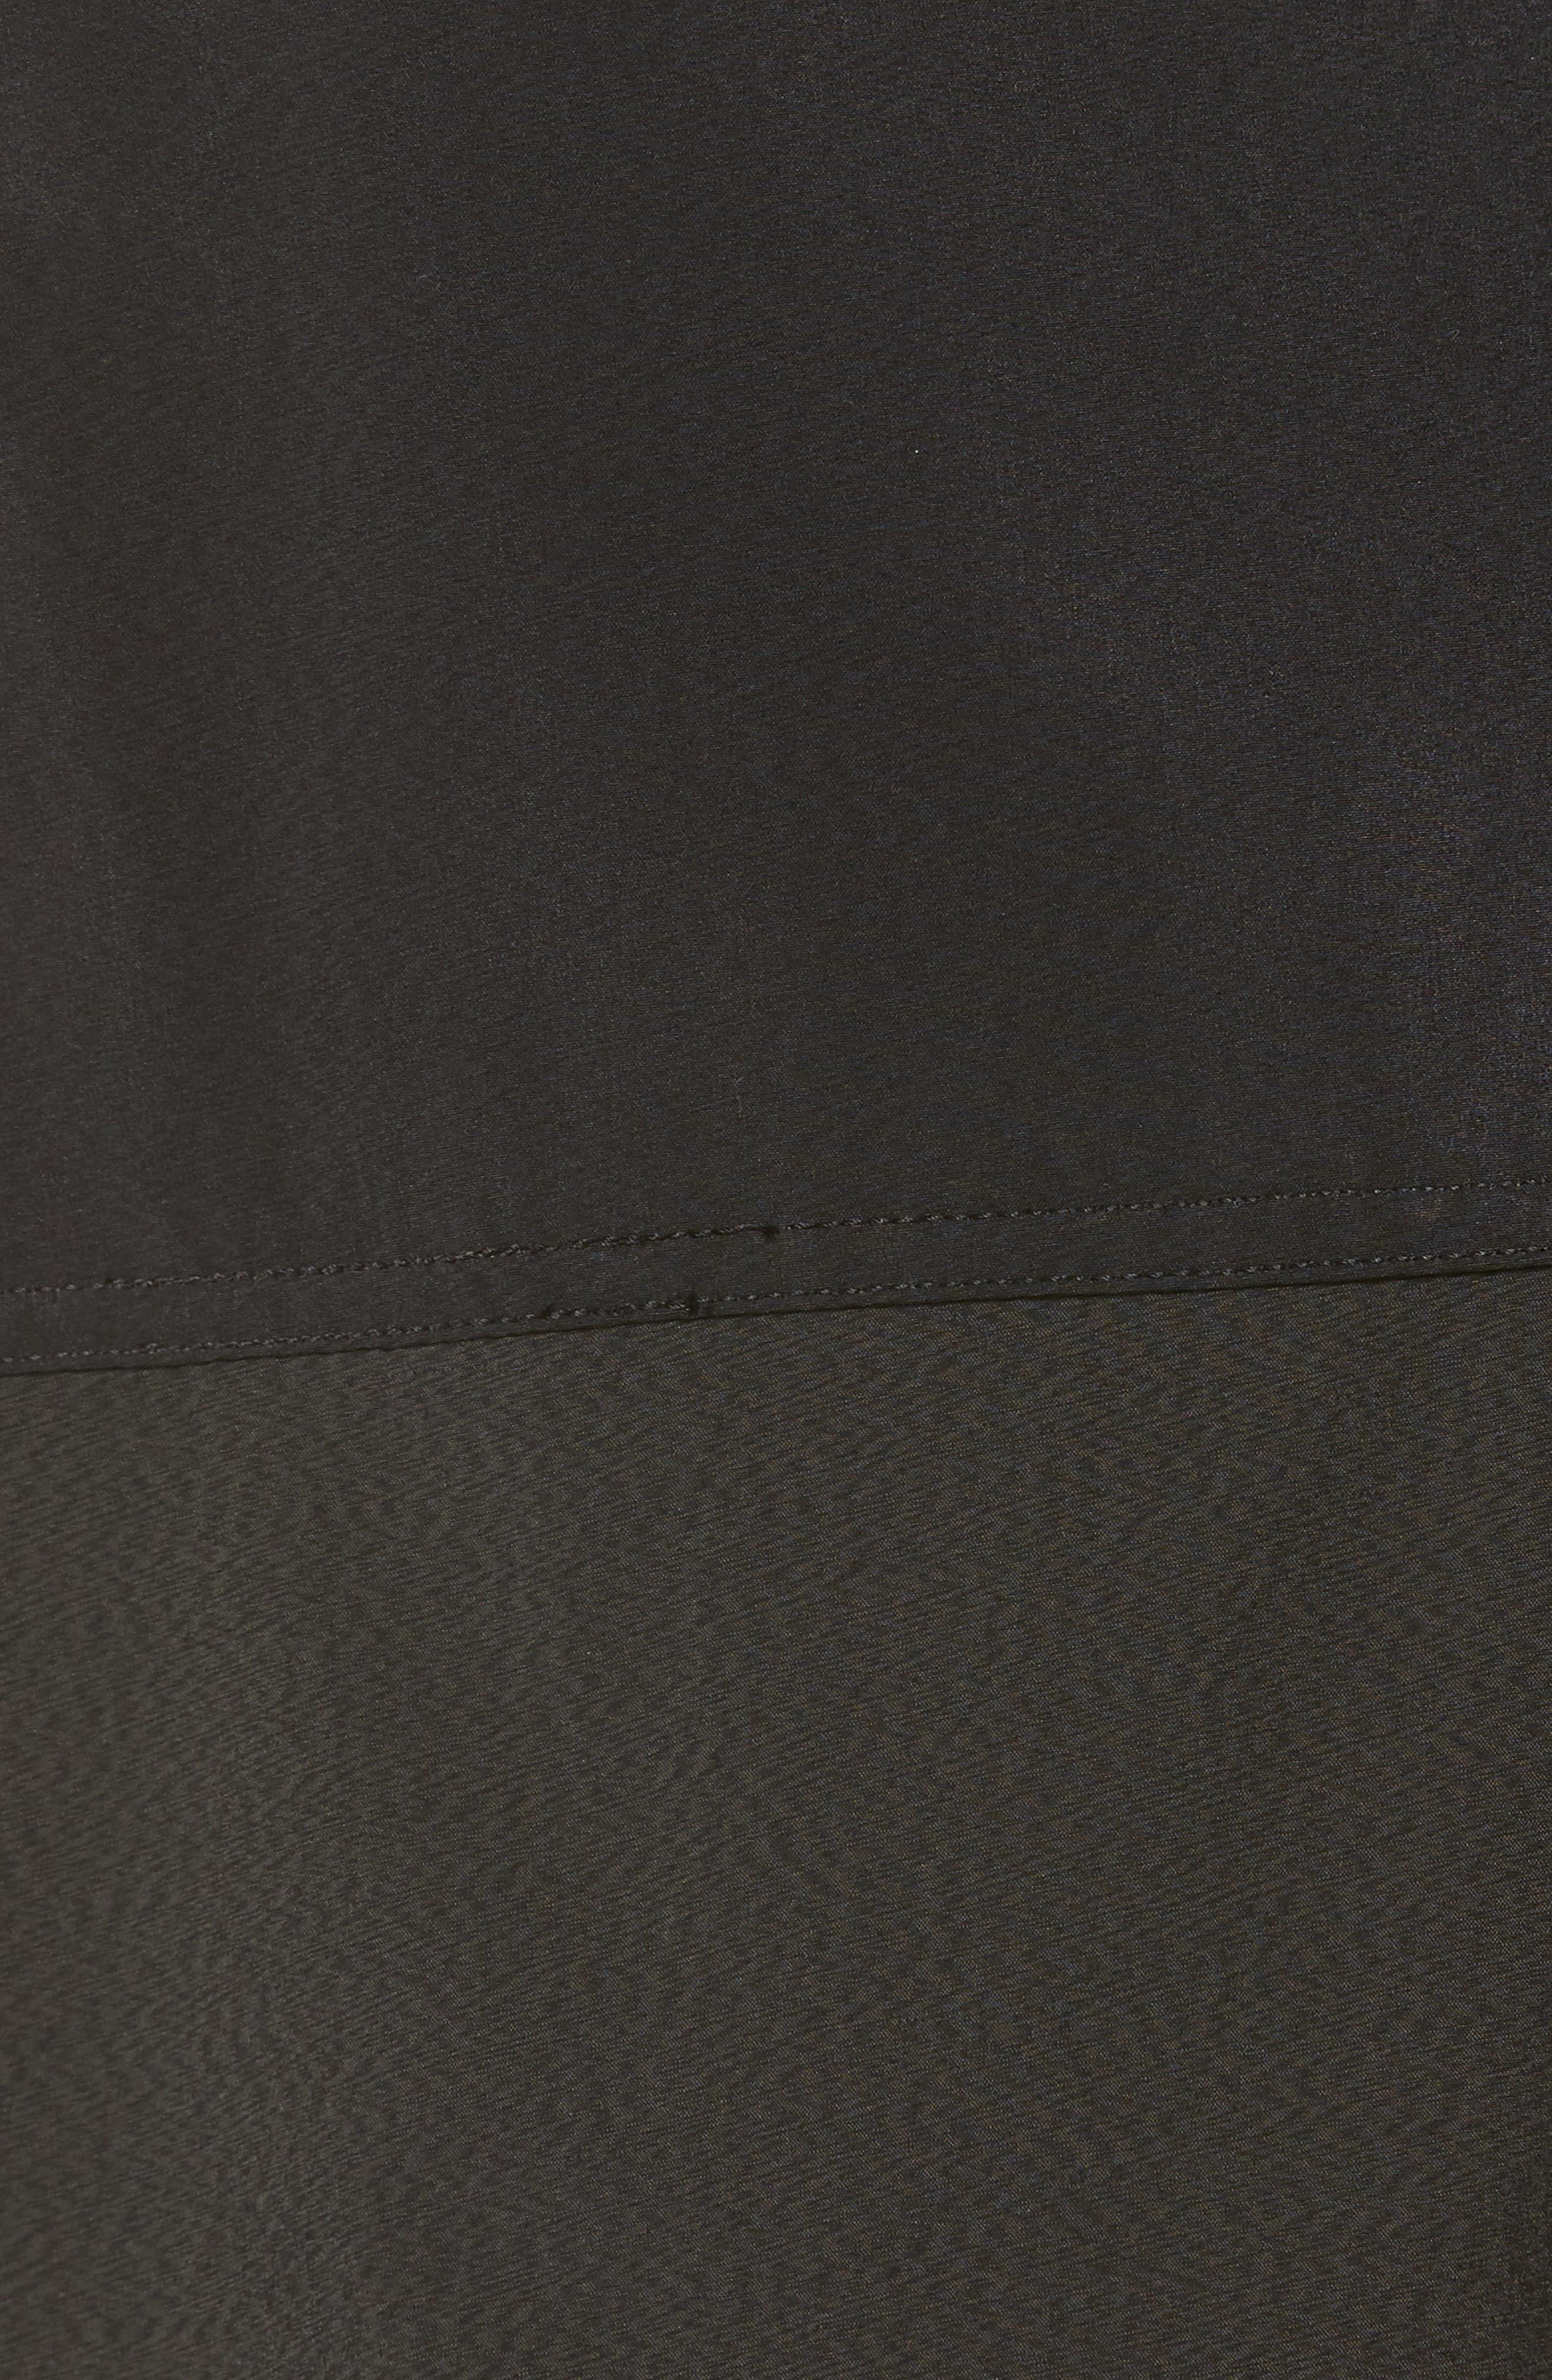 Surf 'n Turf Block Hybrid Shorts,                             Alternate thumbnail 5, color,                             Black